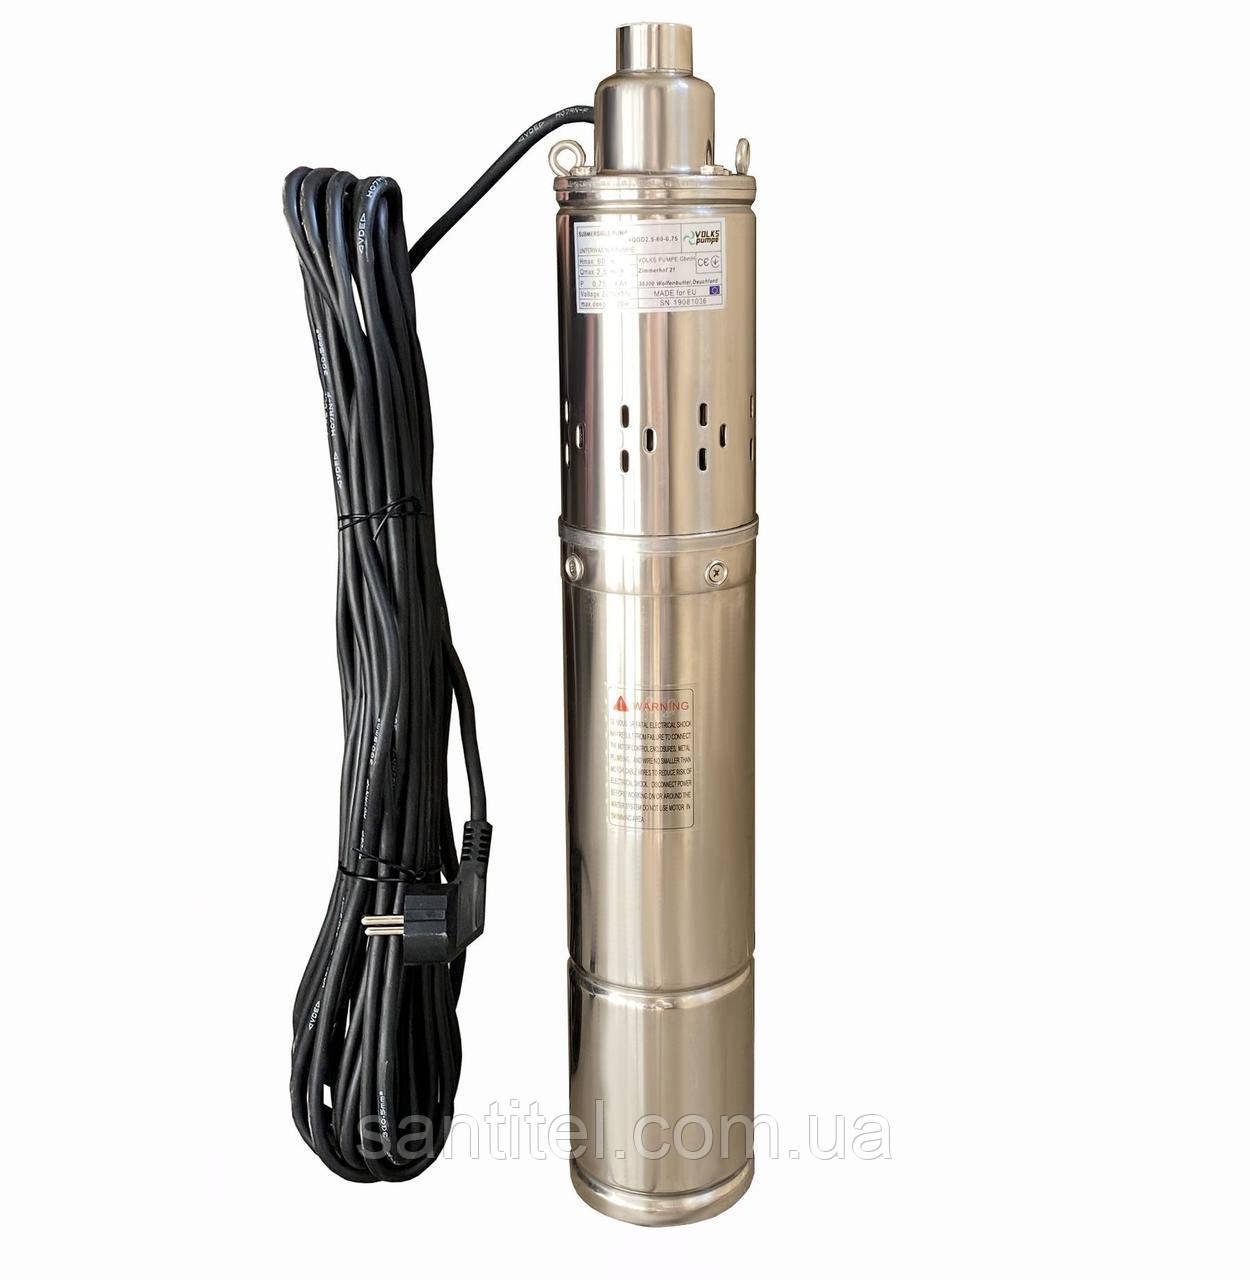 Насос свердловинний шнековий VOLKS pumpe 4 QGD 2,5-60-0,75 кВт + кабель 15м